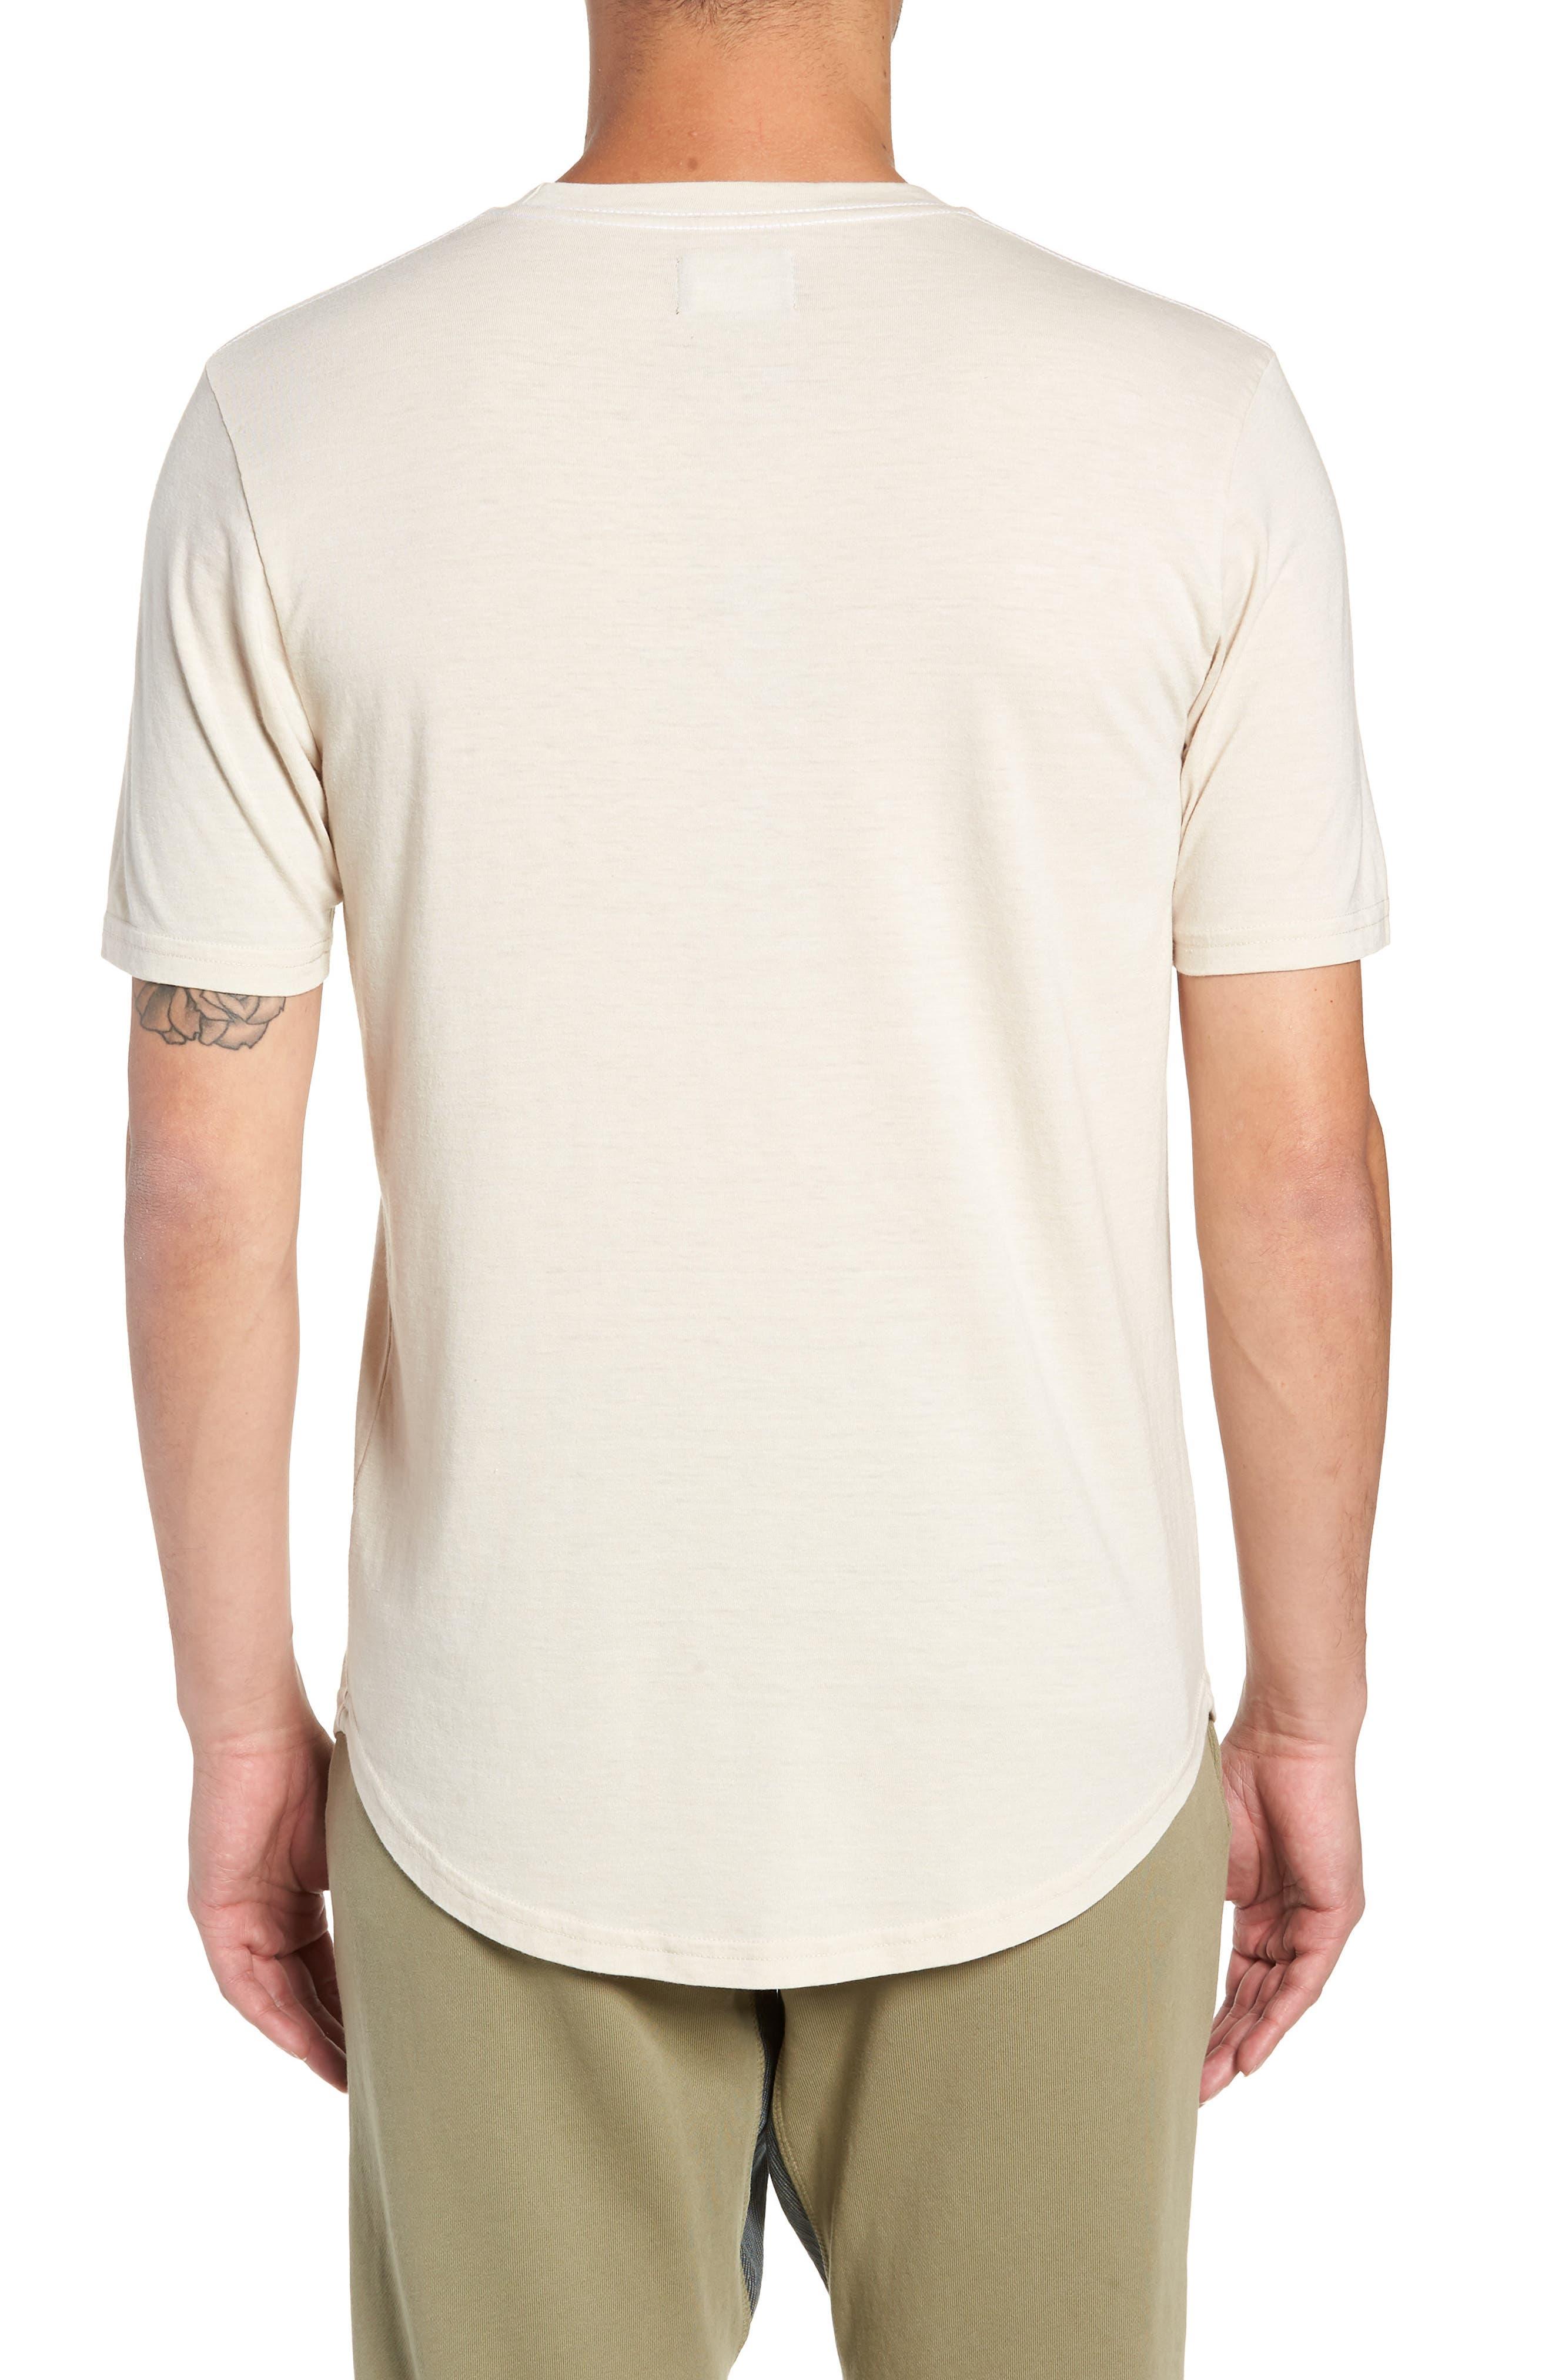 GOODLIFE, Scallop Triblend Crewneck T-Shirt, Alternate thumbnail 2, color, OYSTER